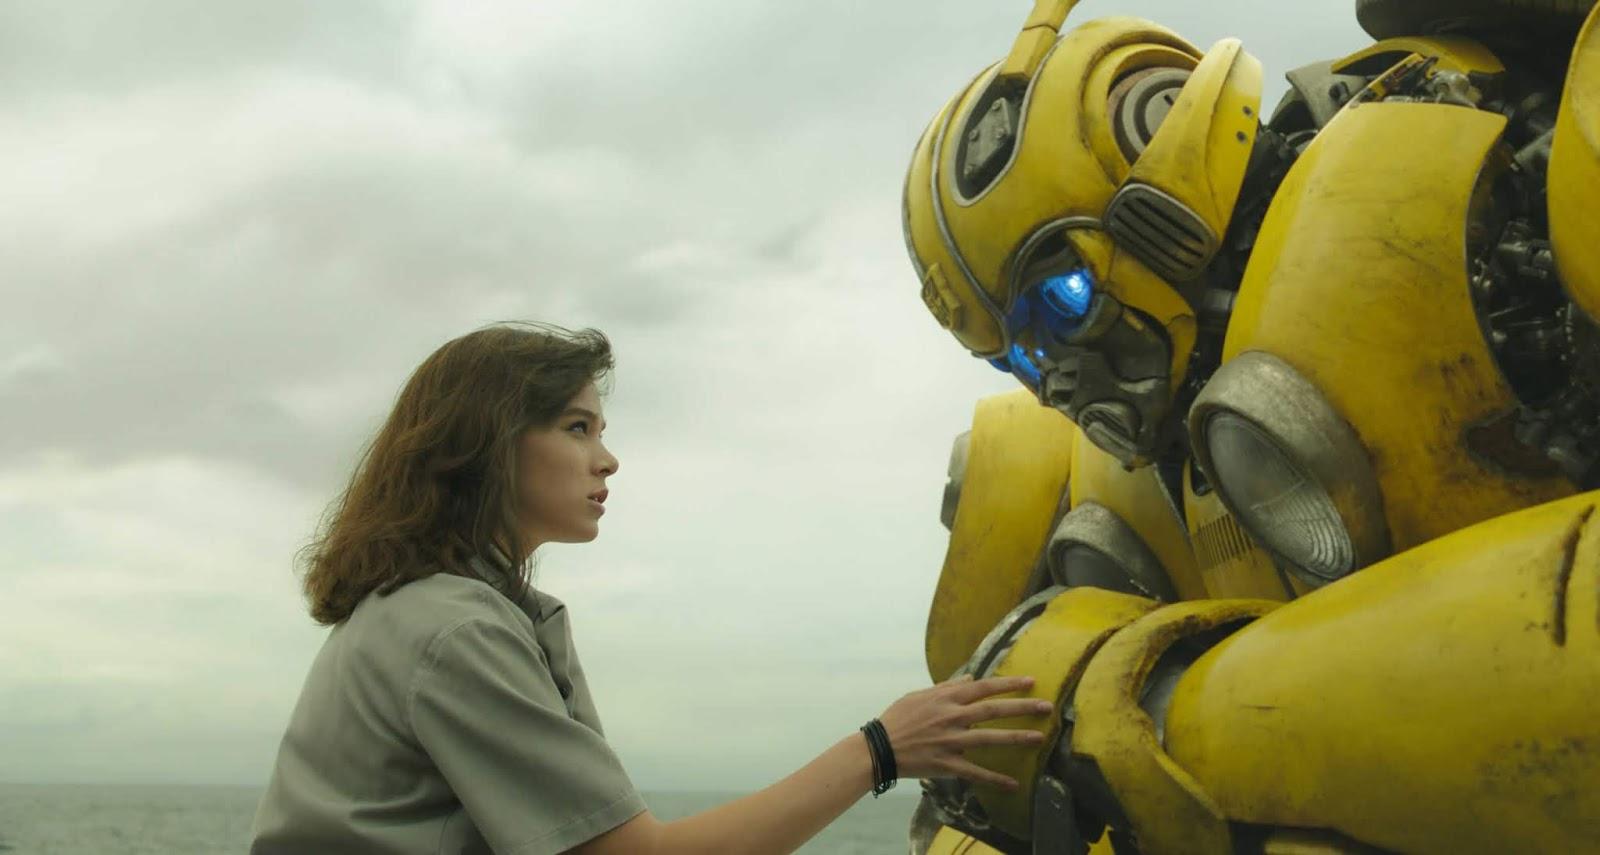 bumblebee, transformers, premiery kinowe